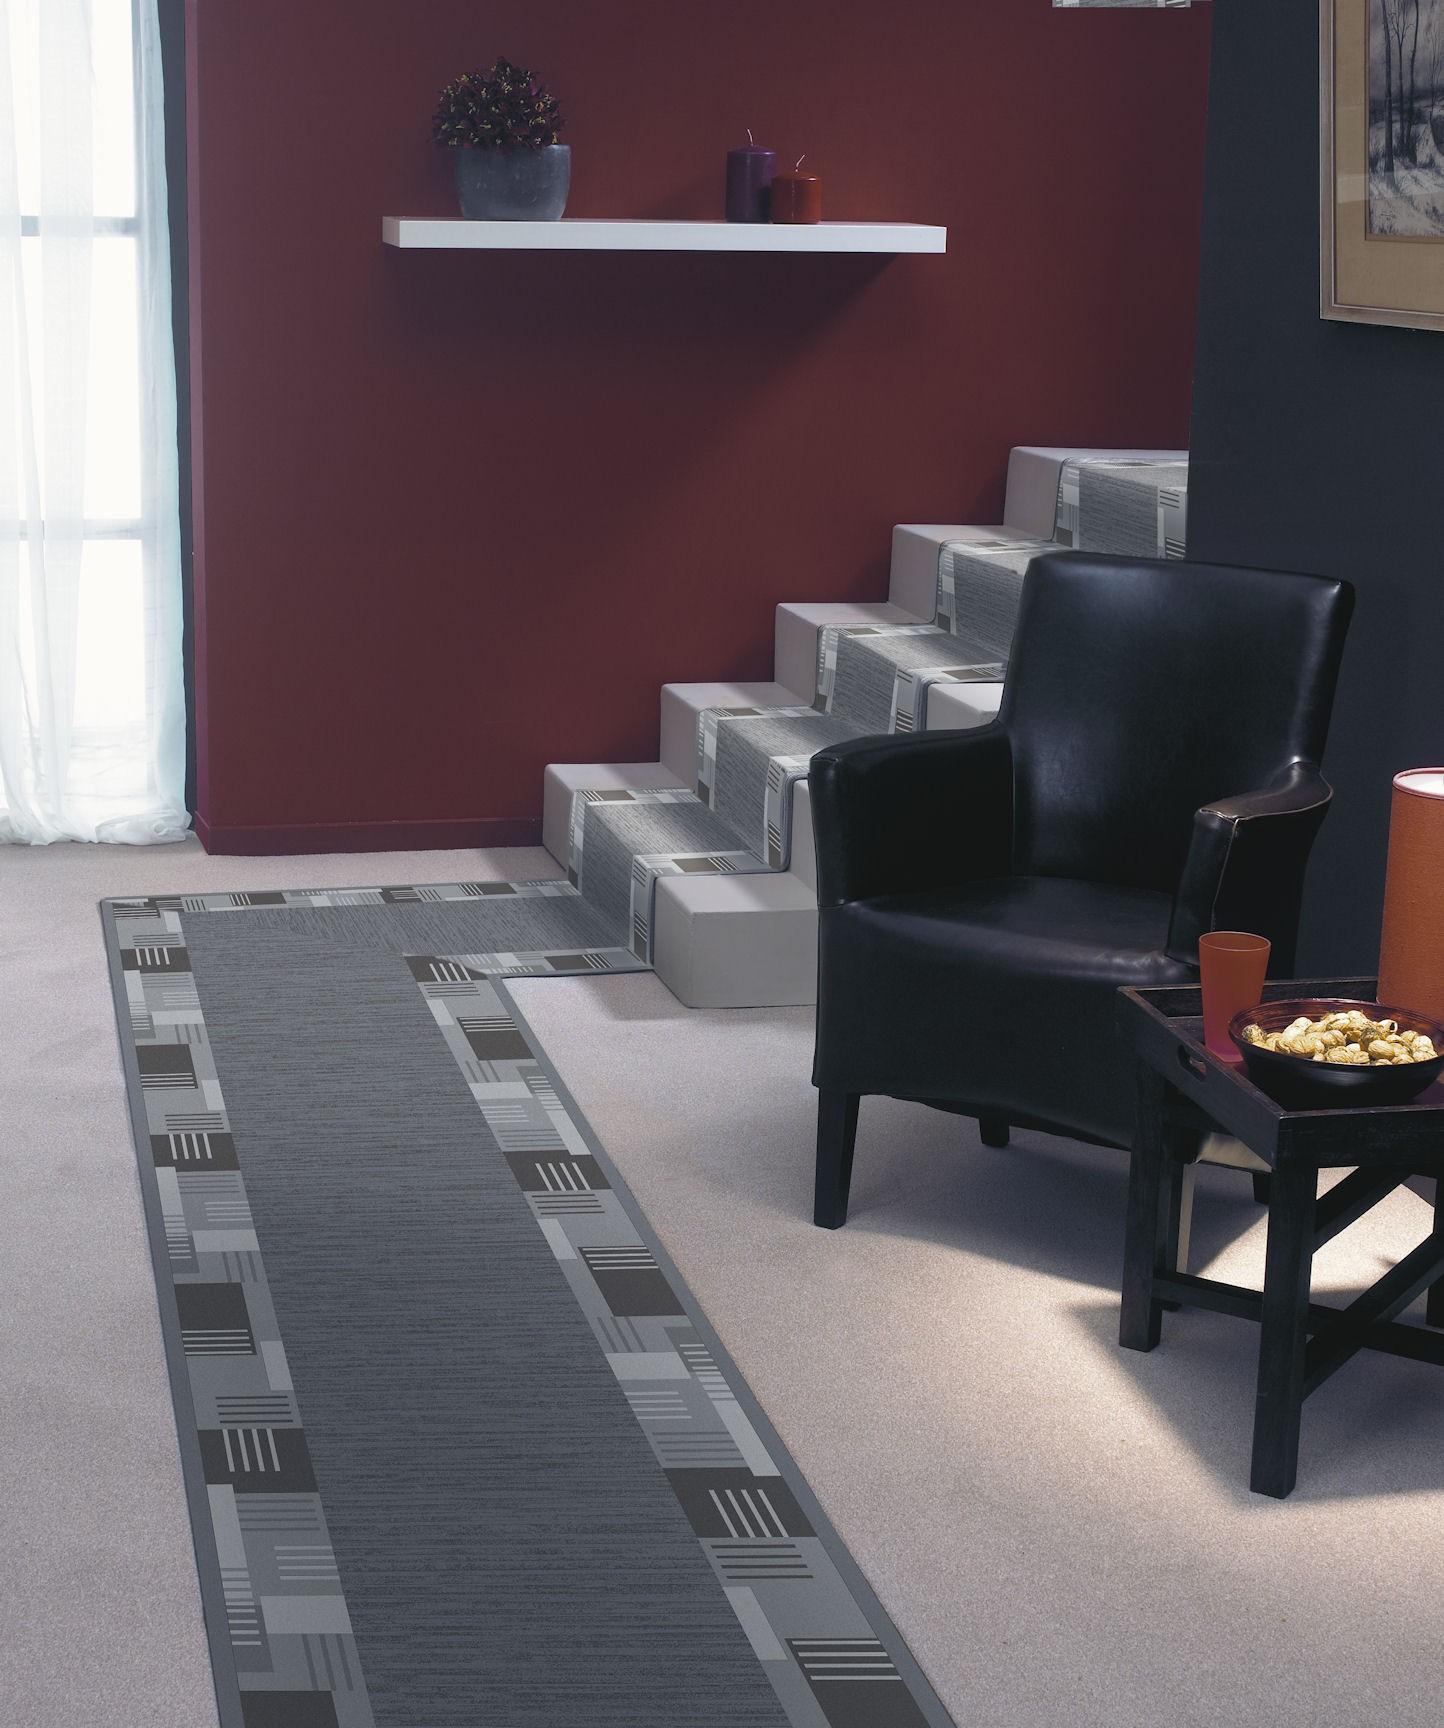 teppich l ufer montana br cke l ufer grau 67 cm breite. Black Bedroom Furniture Sets. Home Design Ideas